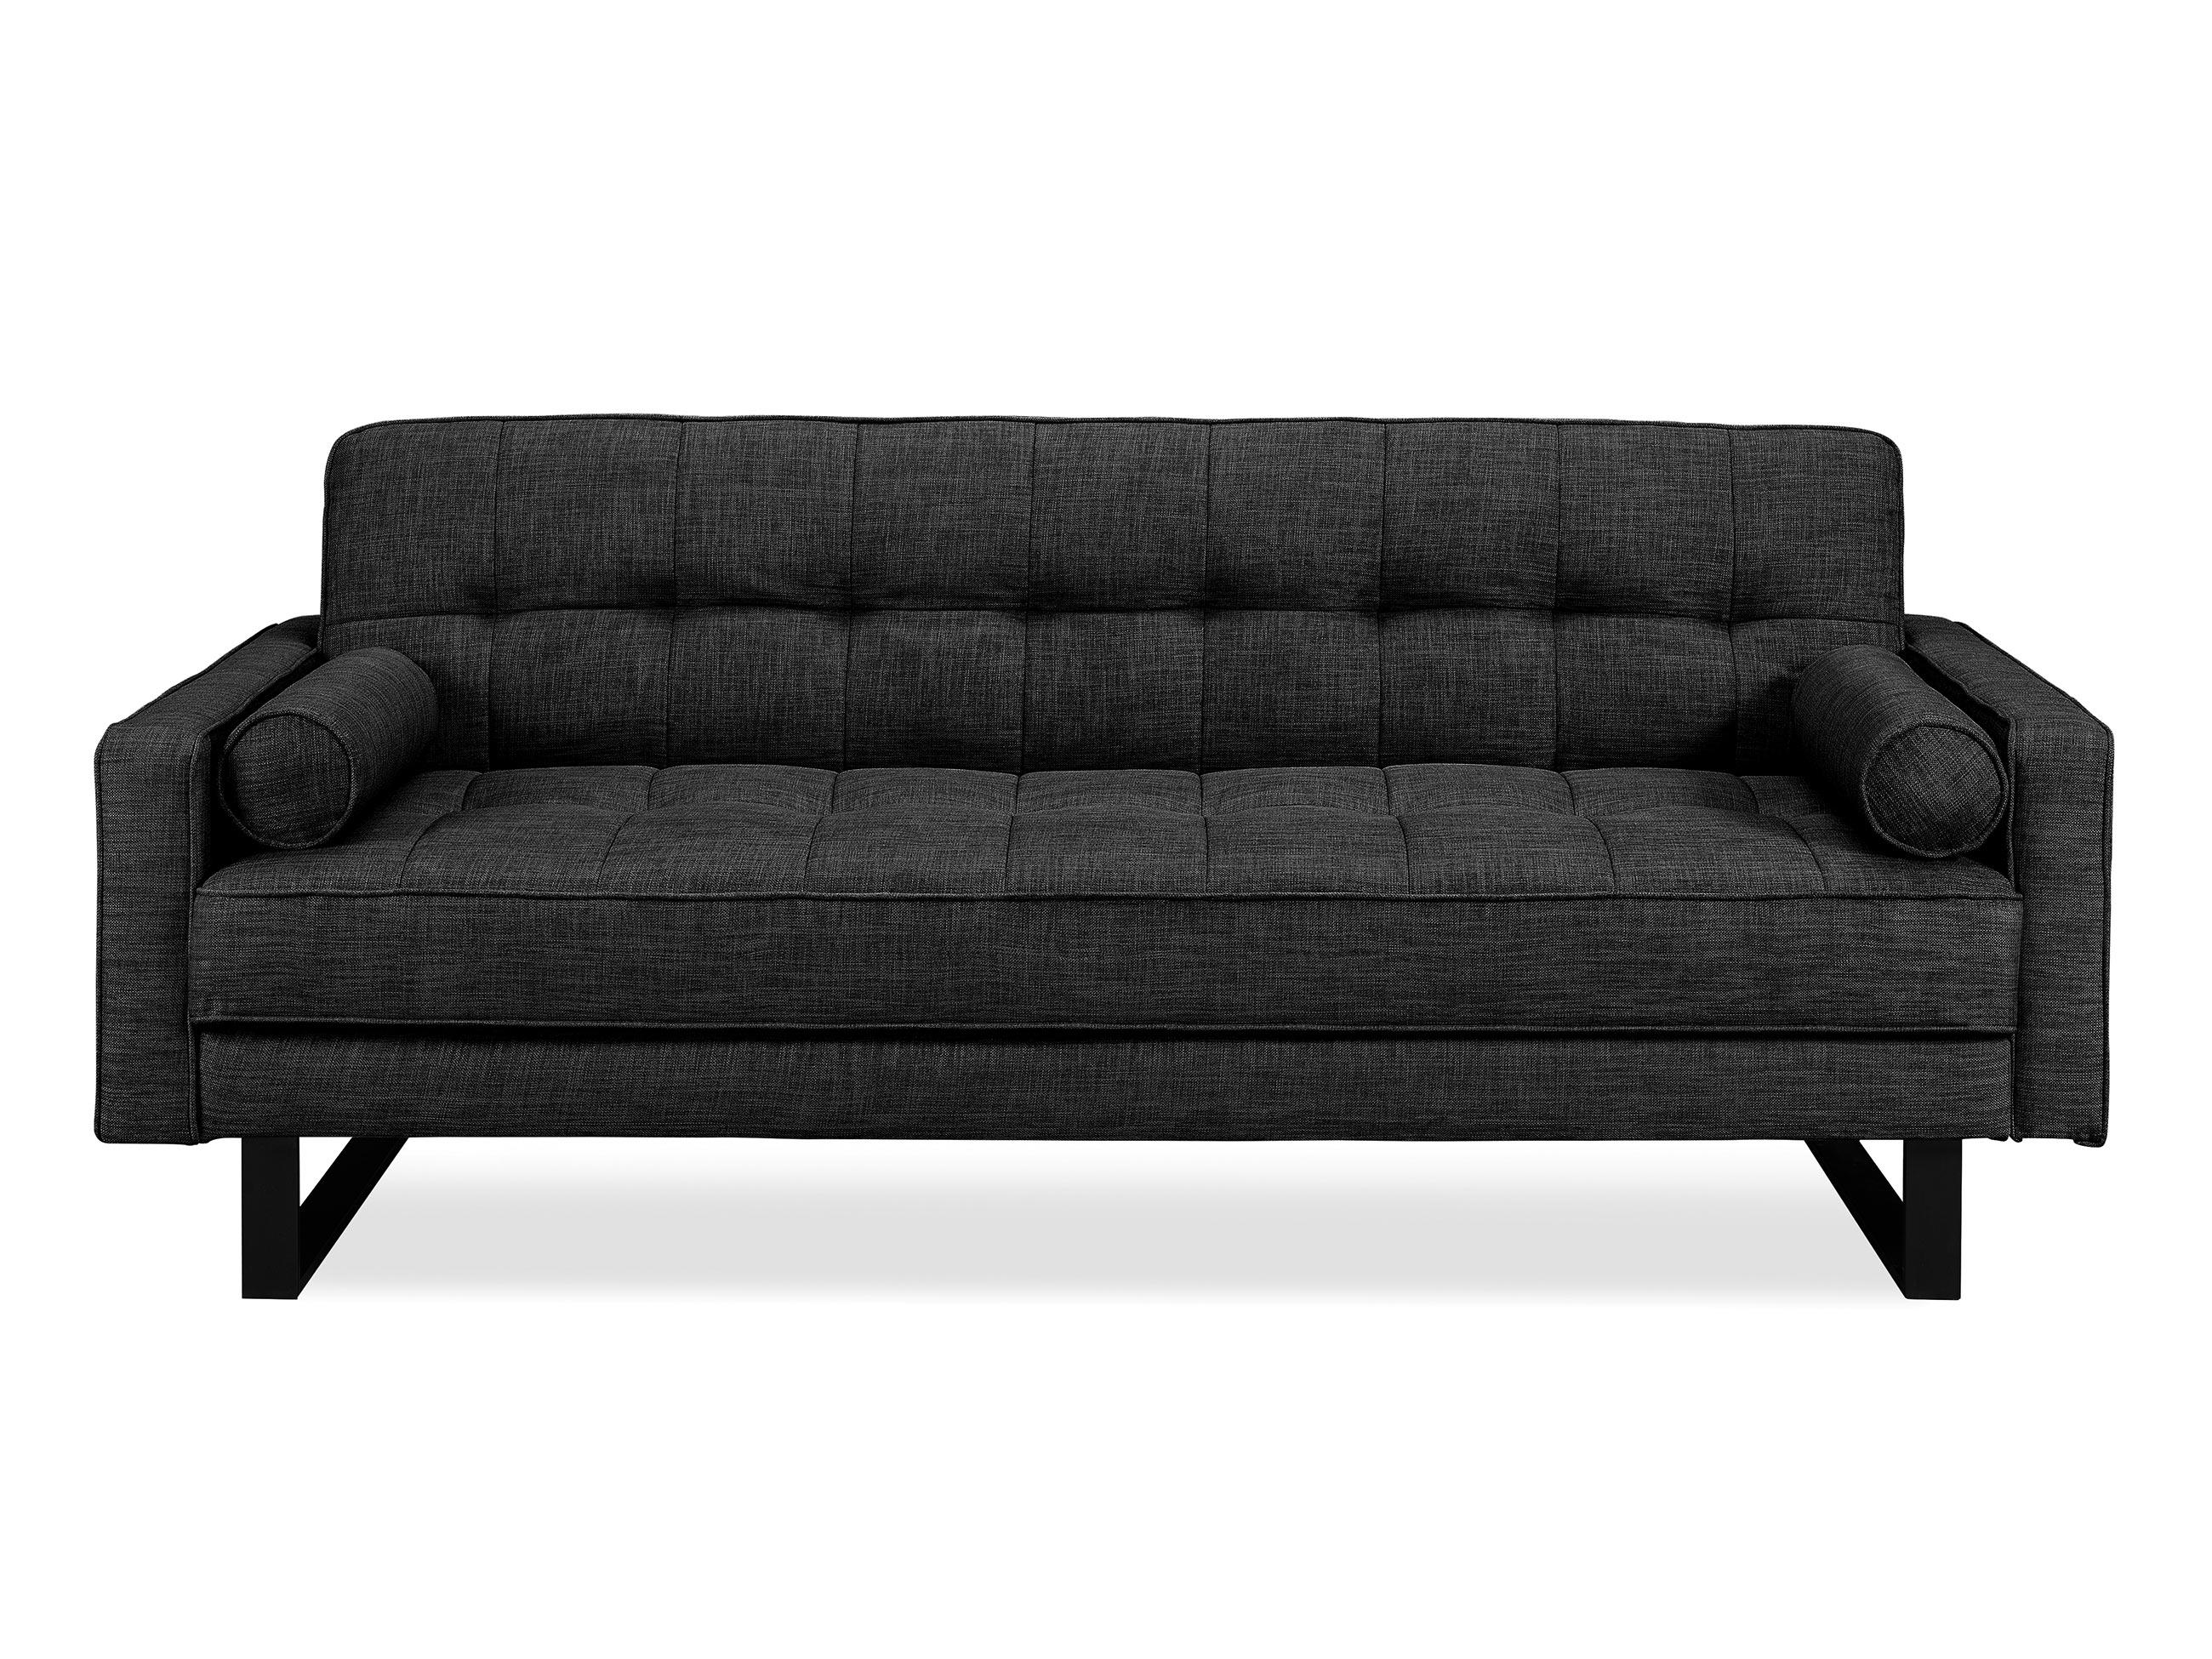 Medina Convertible Sofa Charcoal Grey by Serta Lifestyle